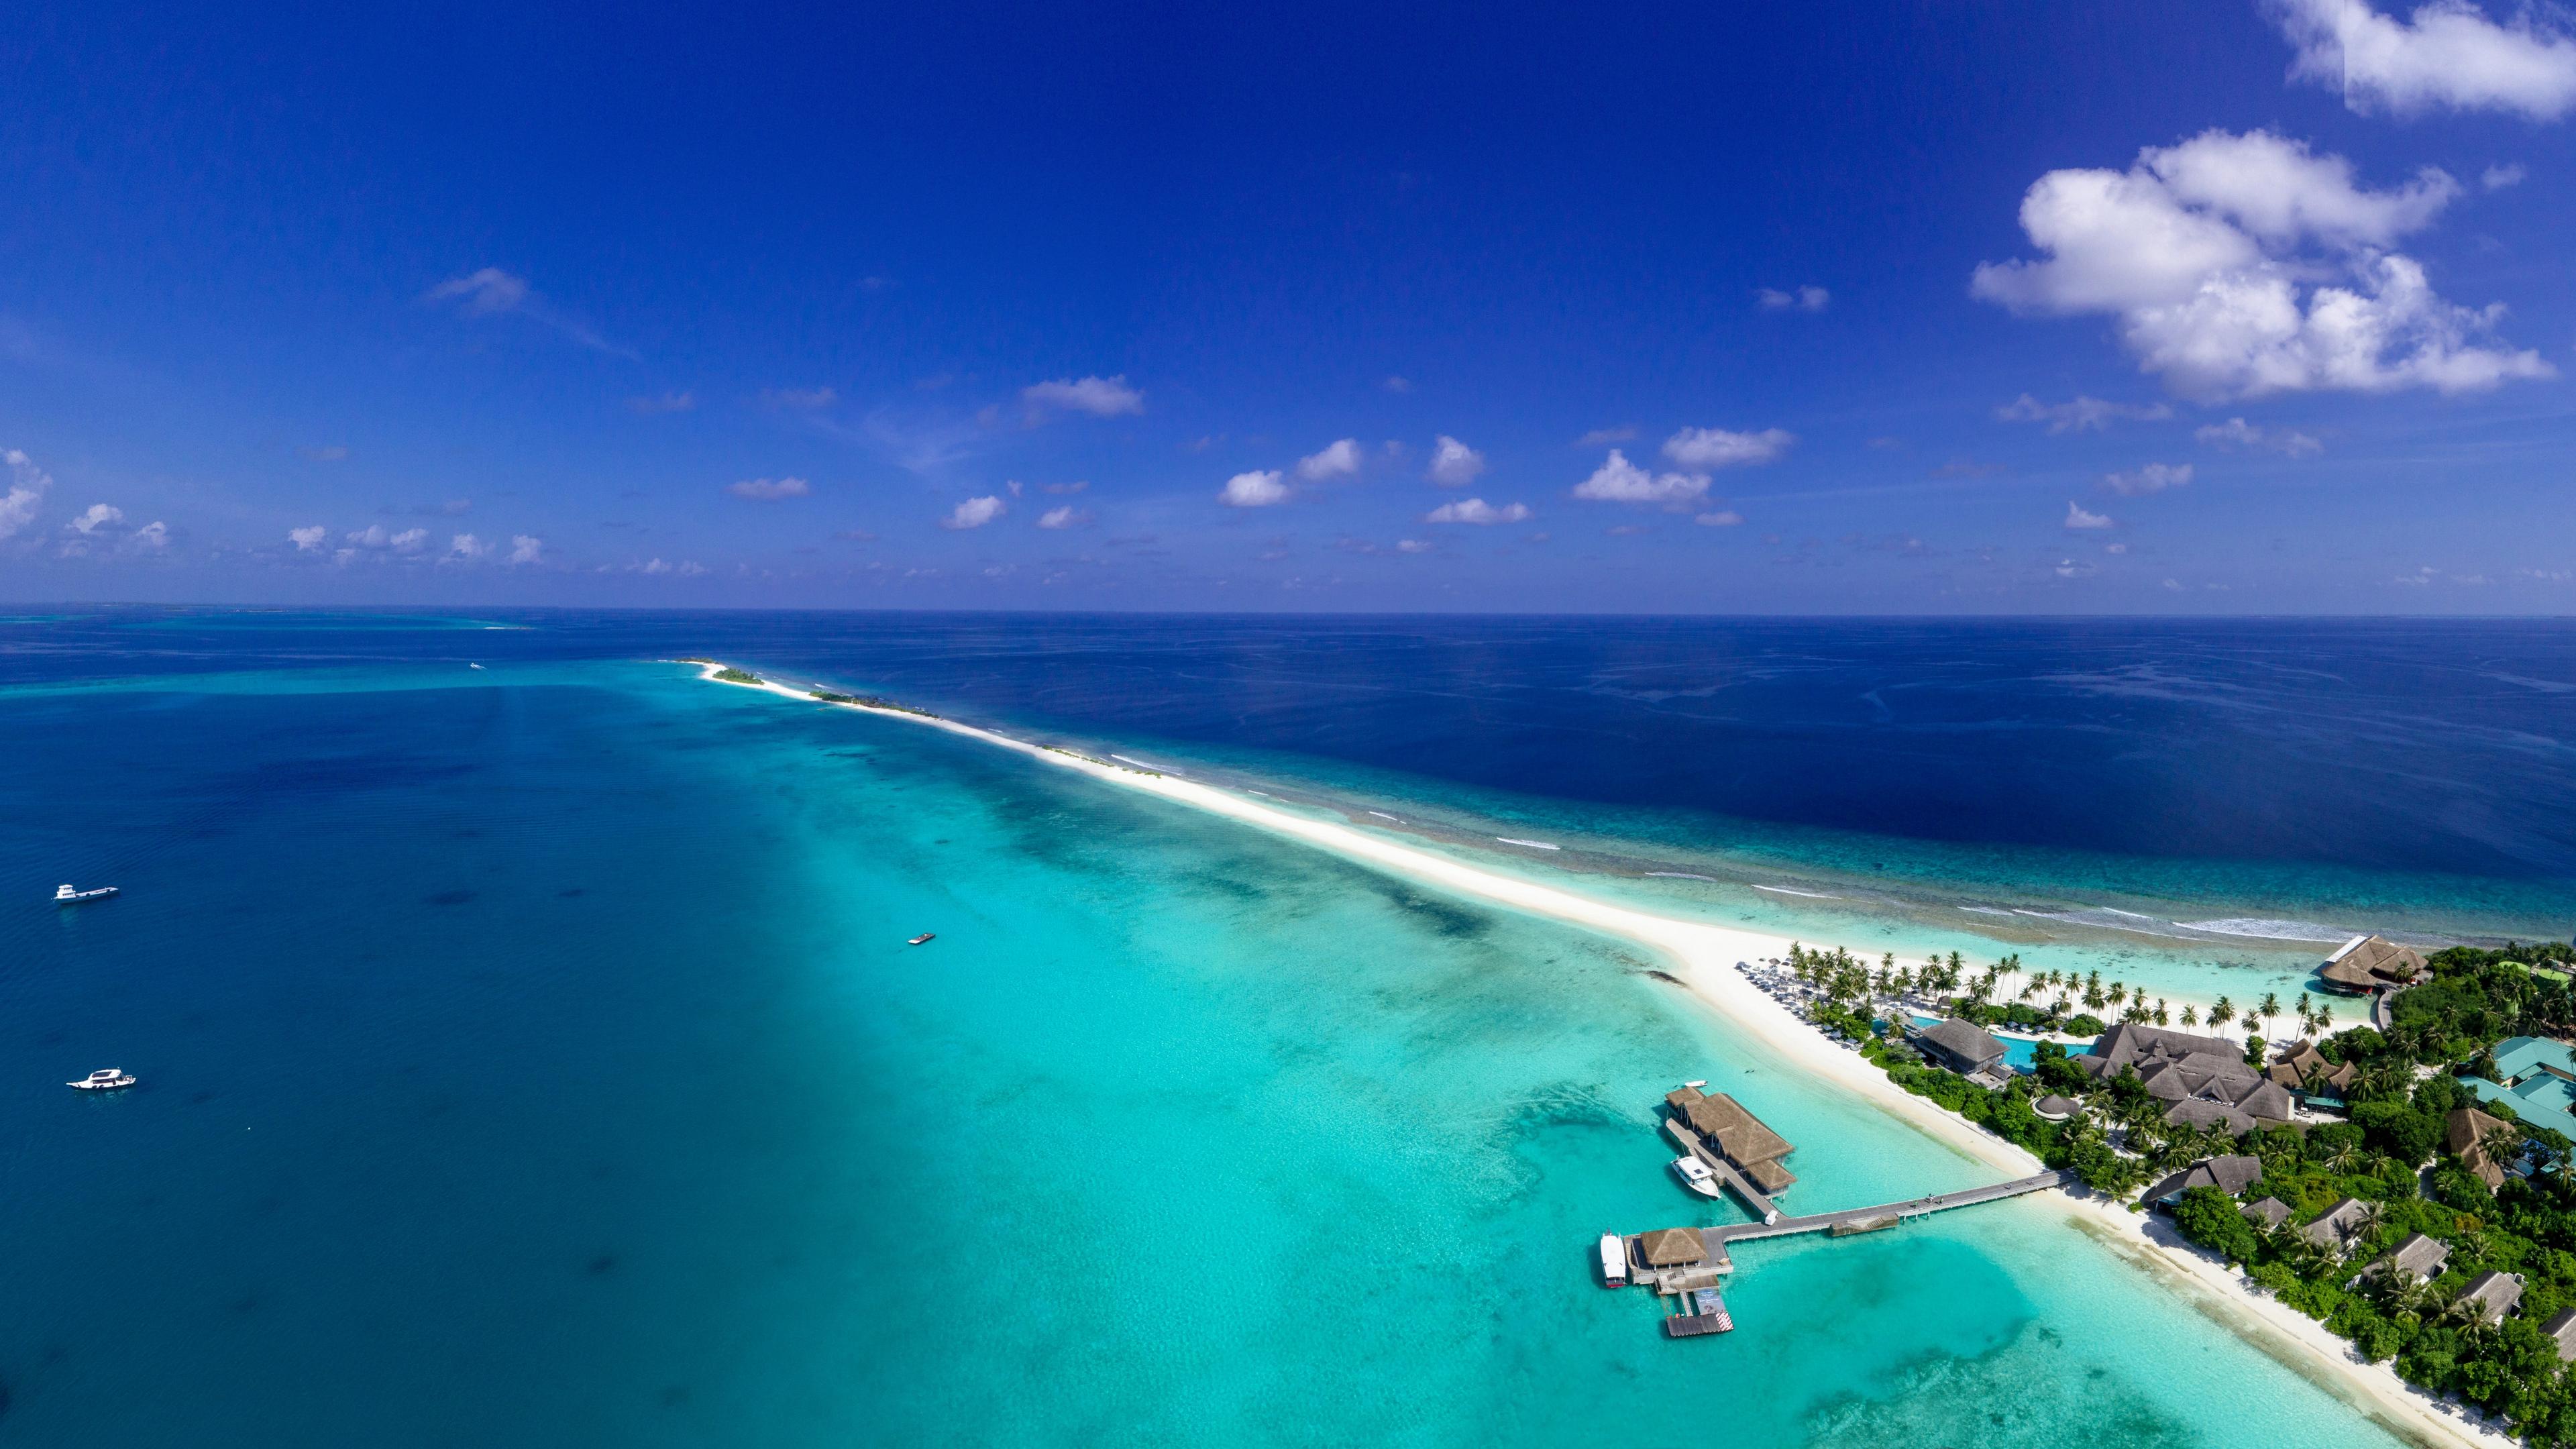 island ocean aerial view tropics vacation paradise 4k 1541117514 - island, ocean, aerial view, tropics, vacation, paradise 4k - Ocean, Island, aerial view